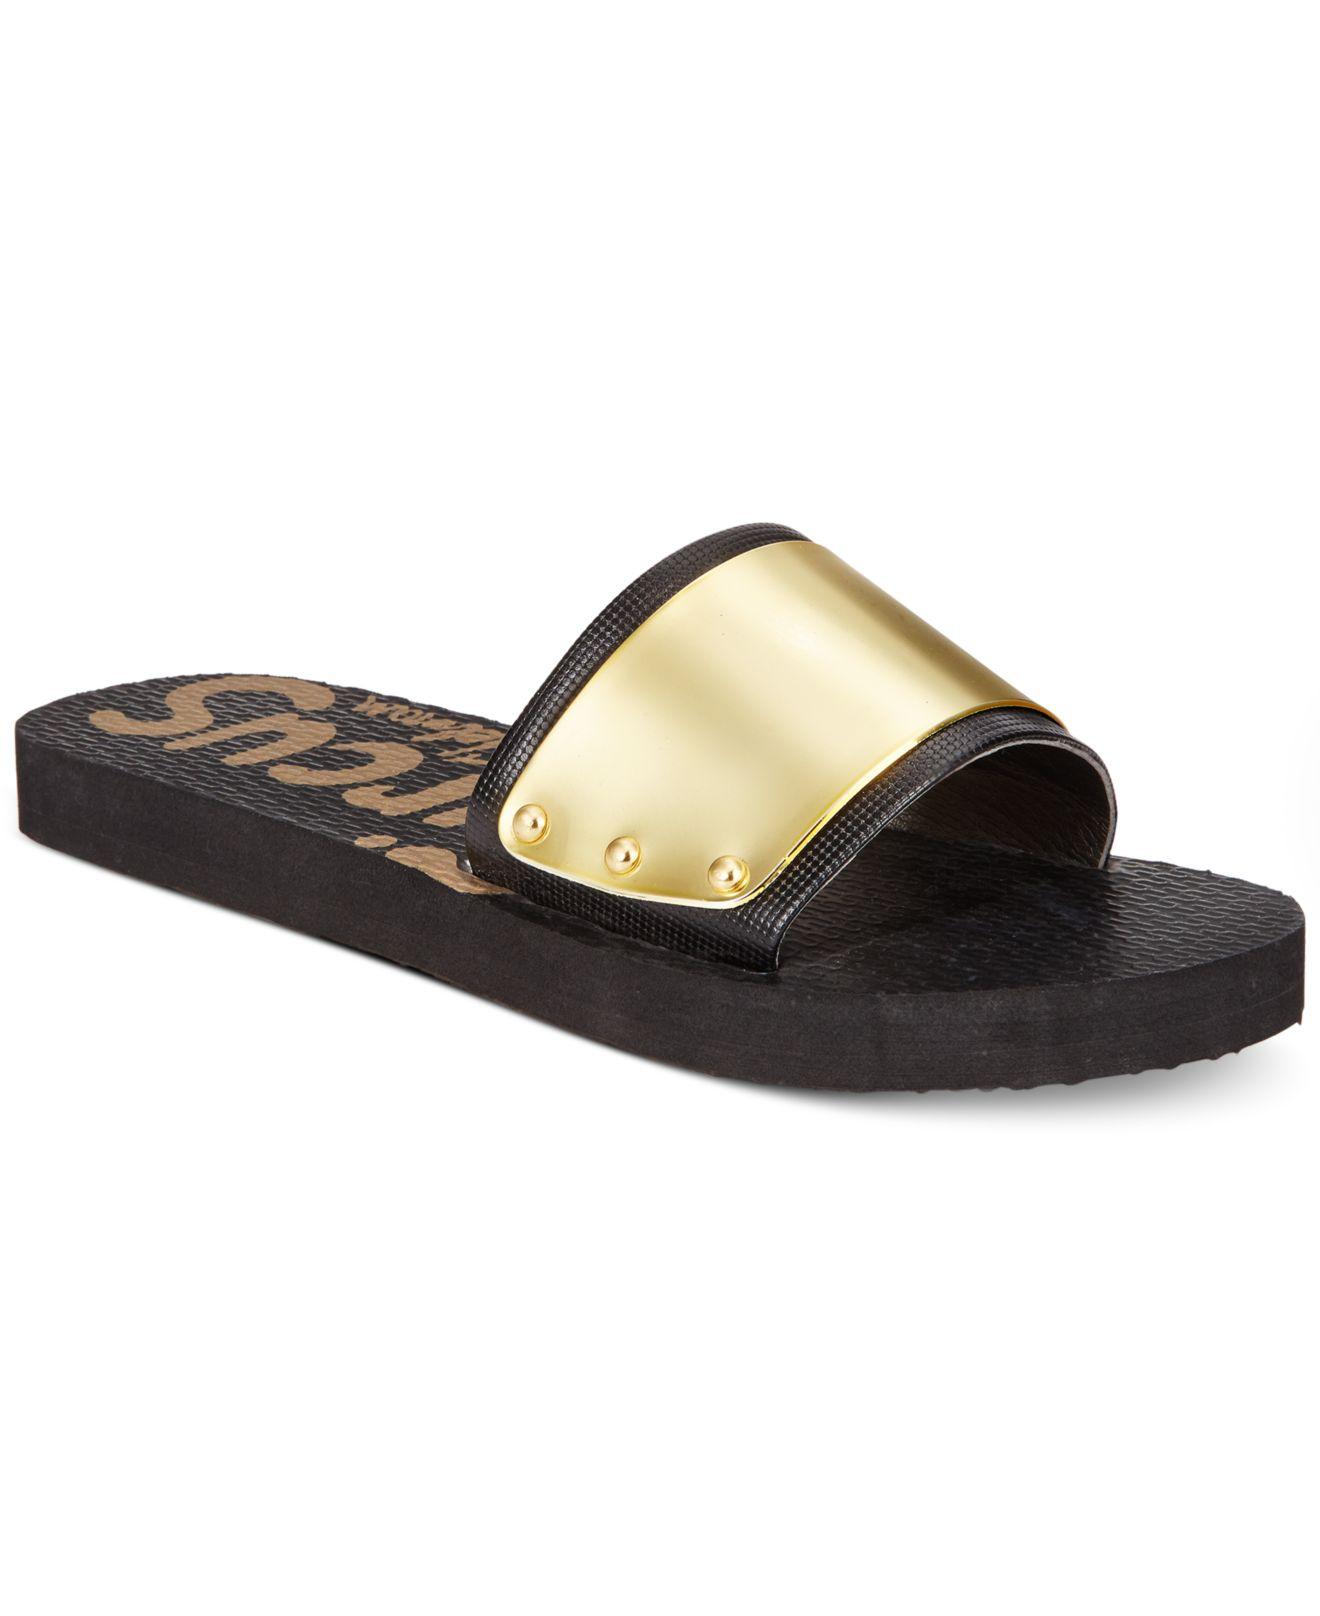 6a288ea83db5 Lyst Circus By Sam Edelman Madison Sport Flat Sandals In Metallic